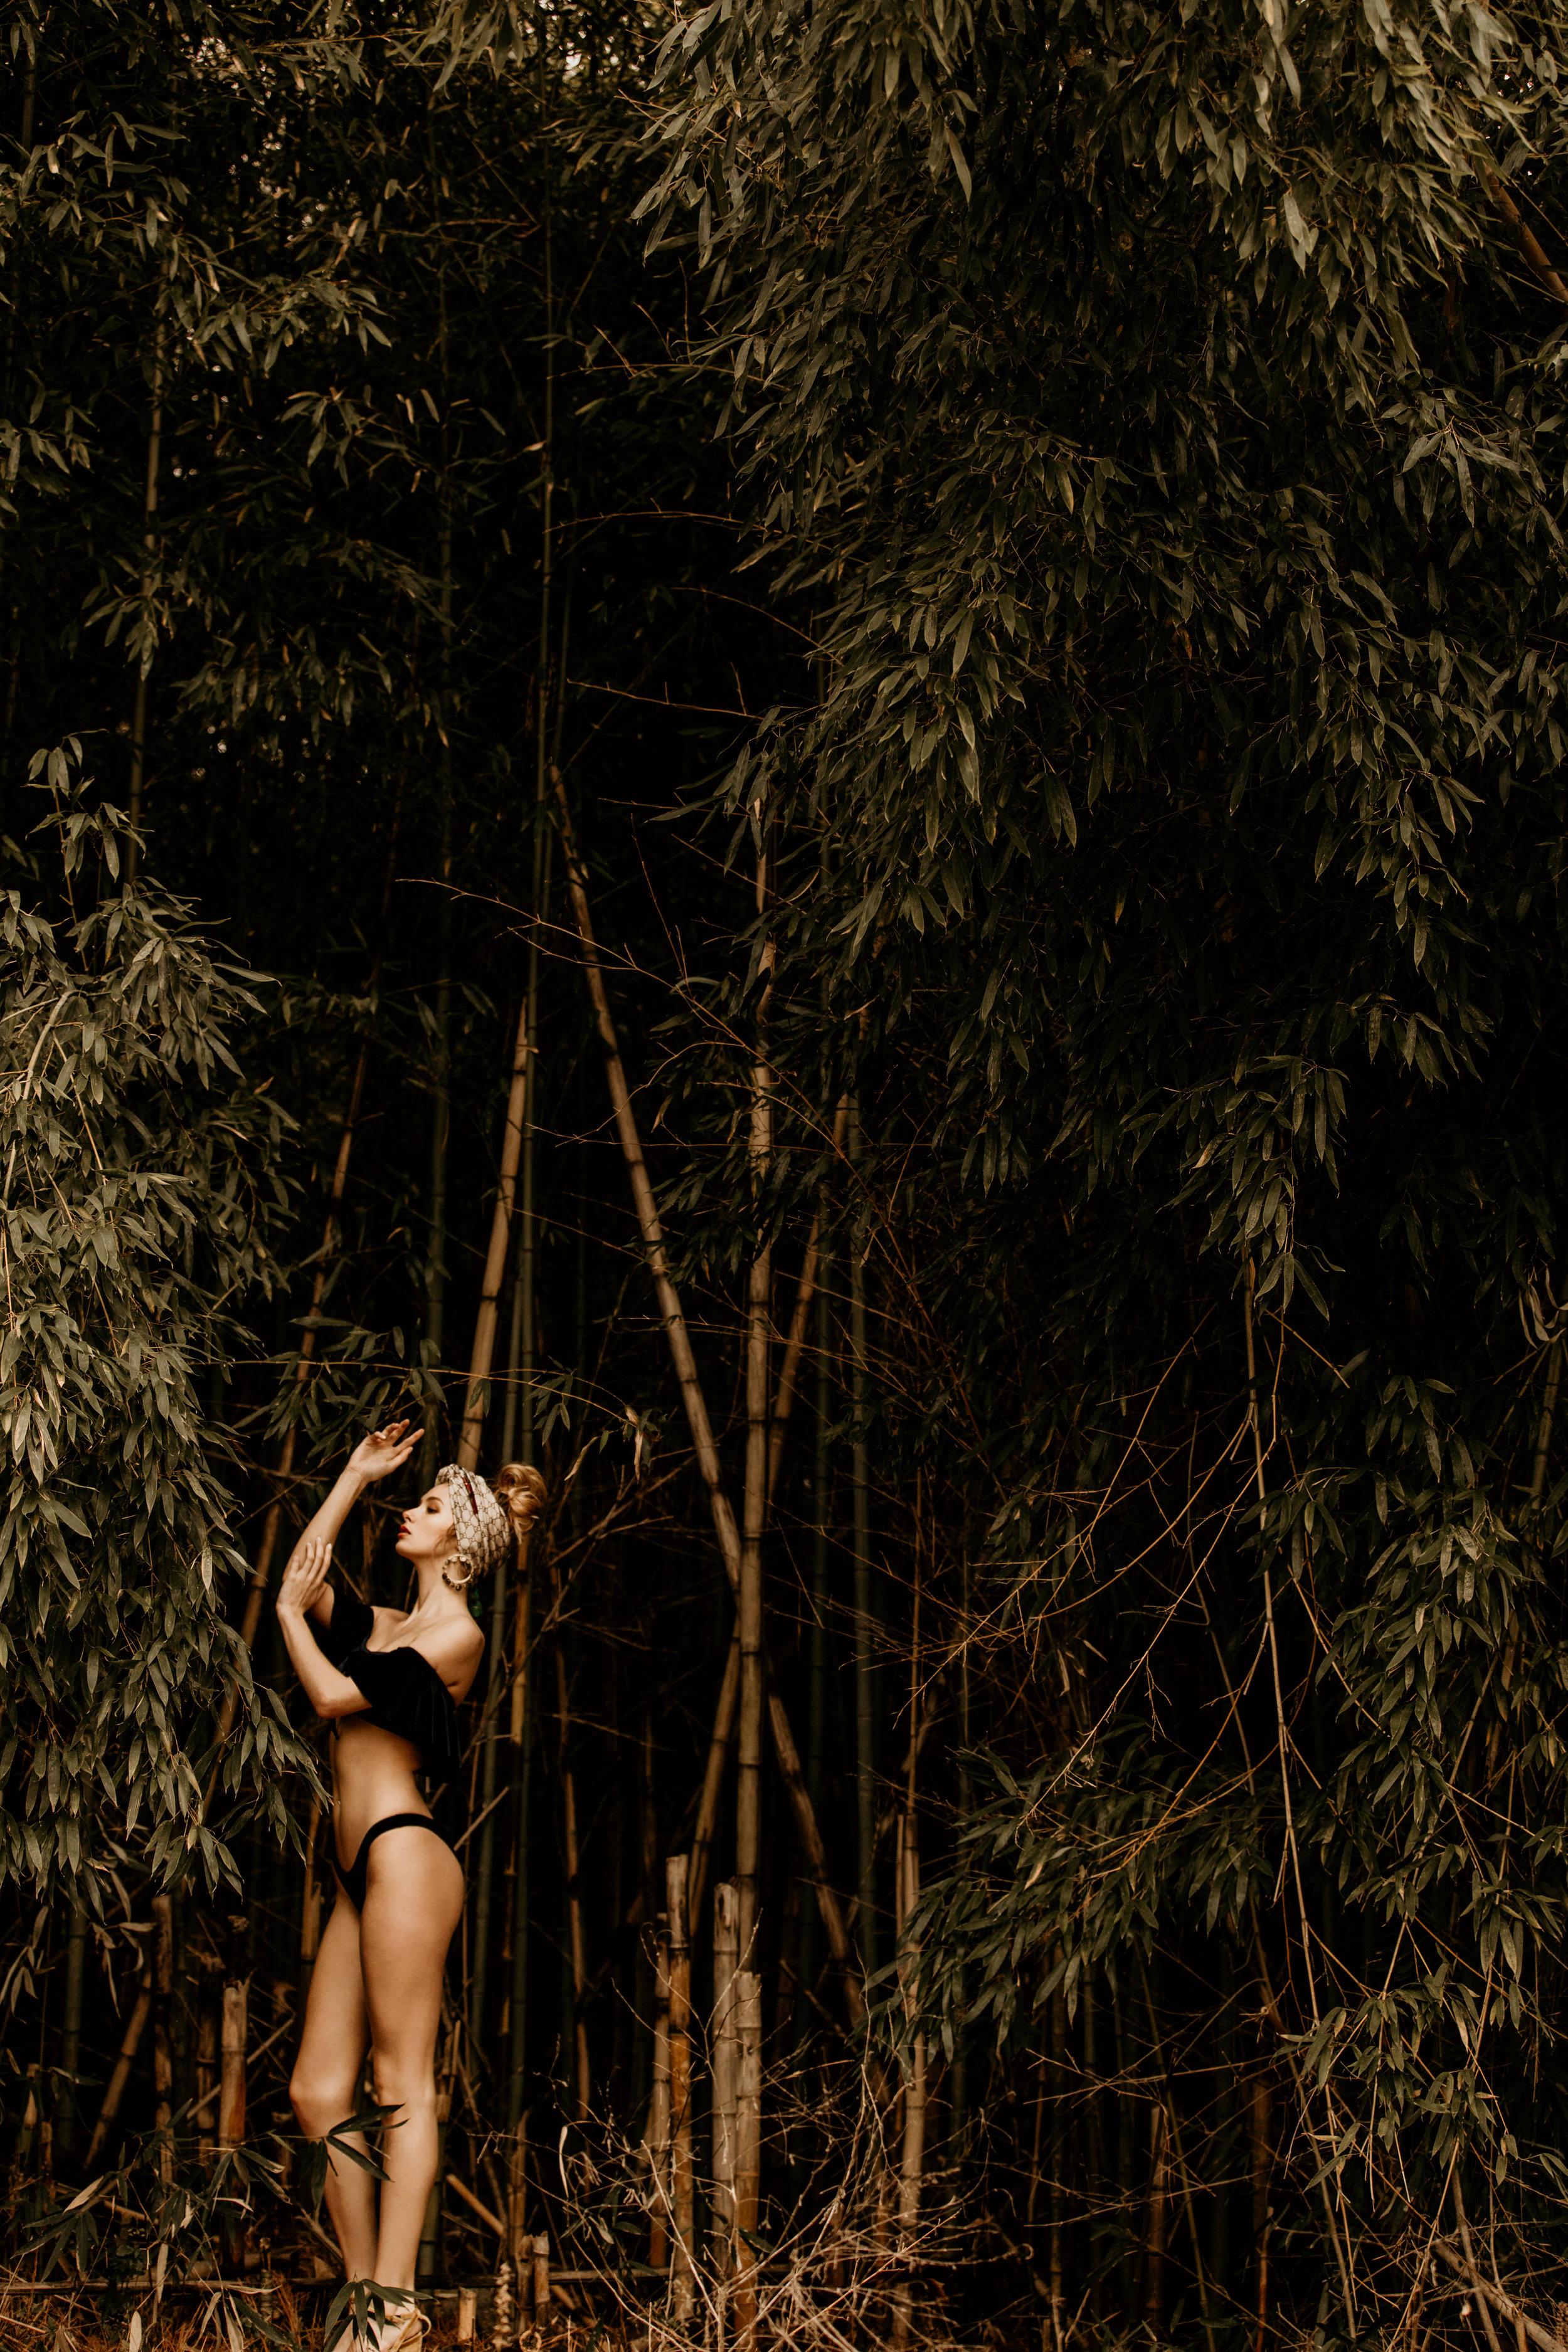 PHOTOGRAPHy-fashion-bamboo-3530ps.jpg